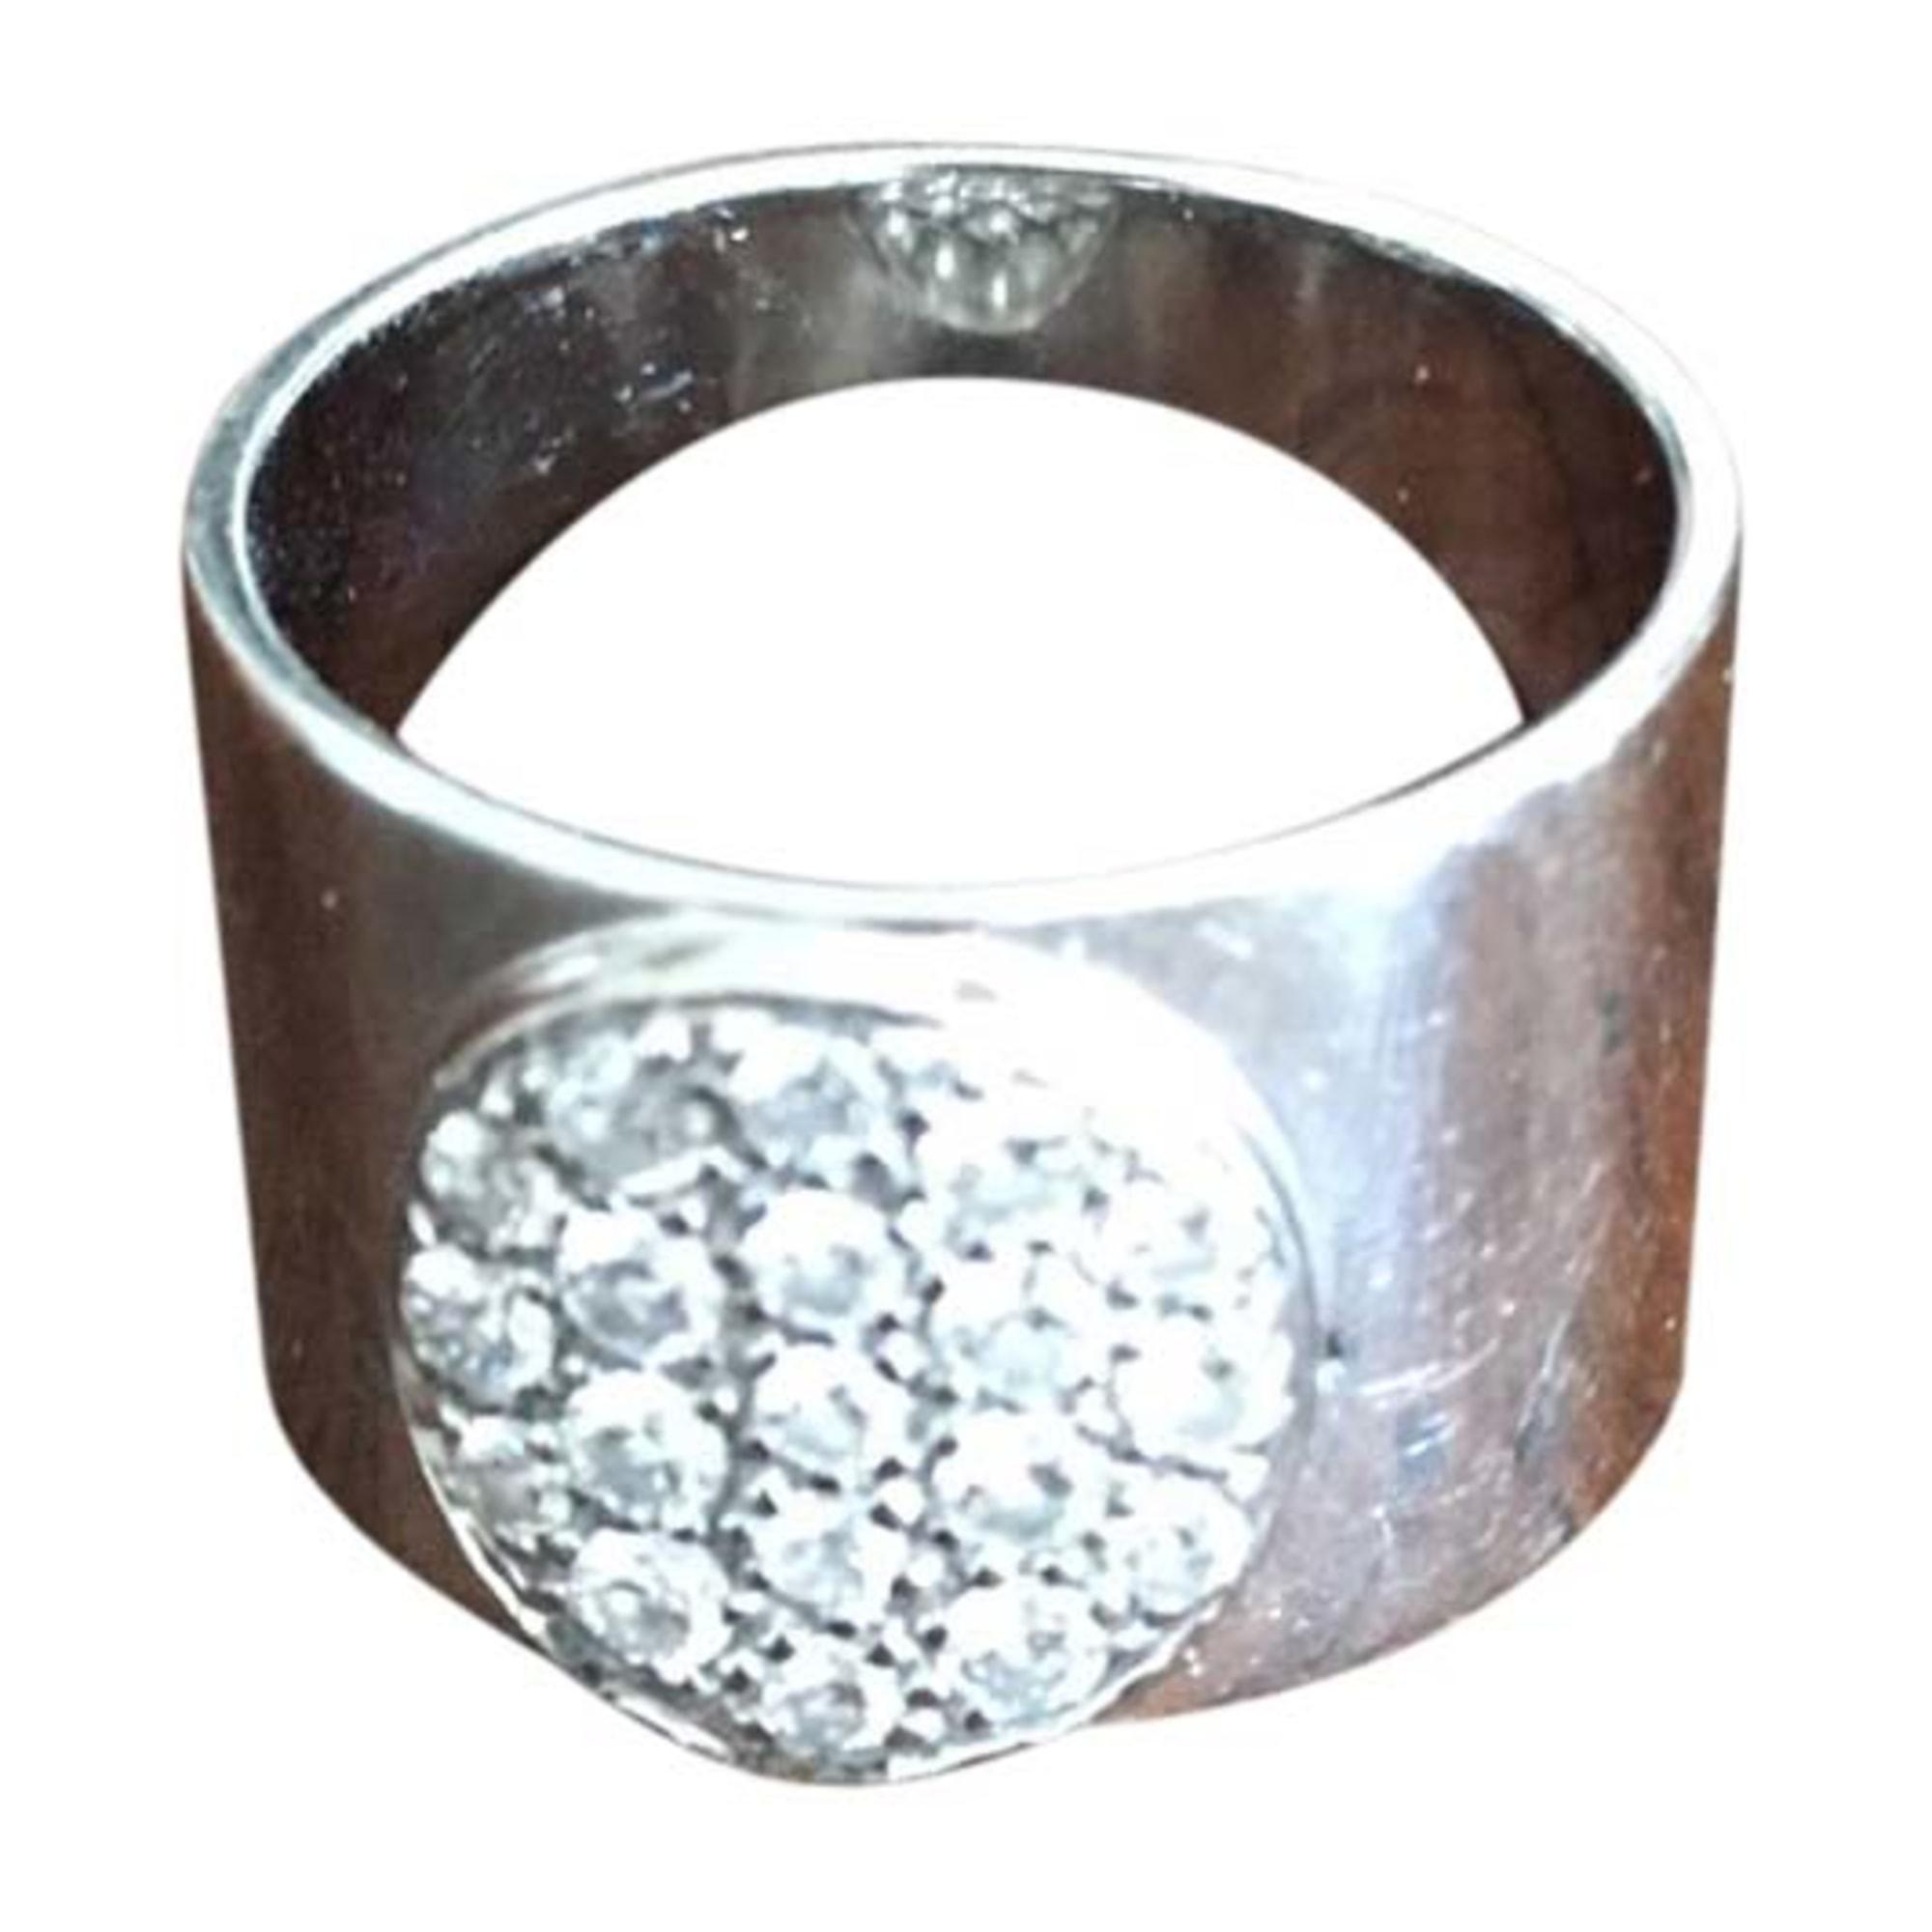 Anello DINH VAN Argentato, acciaio